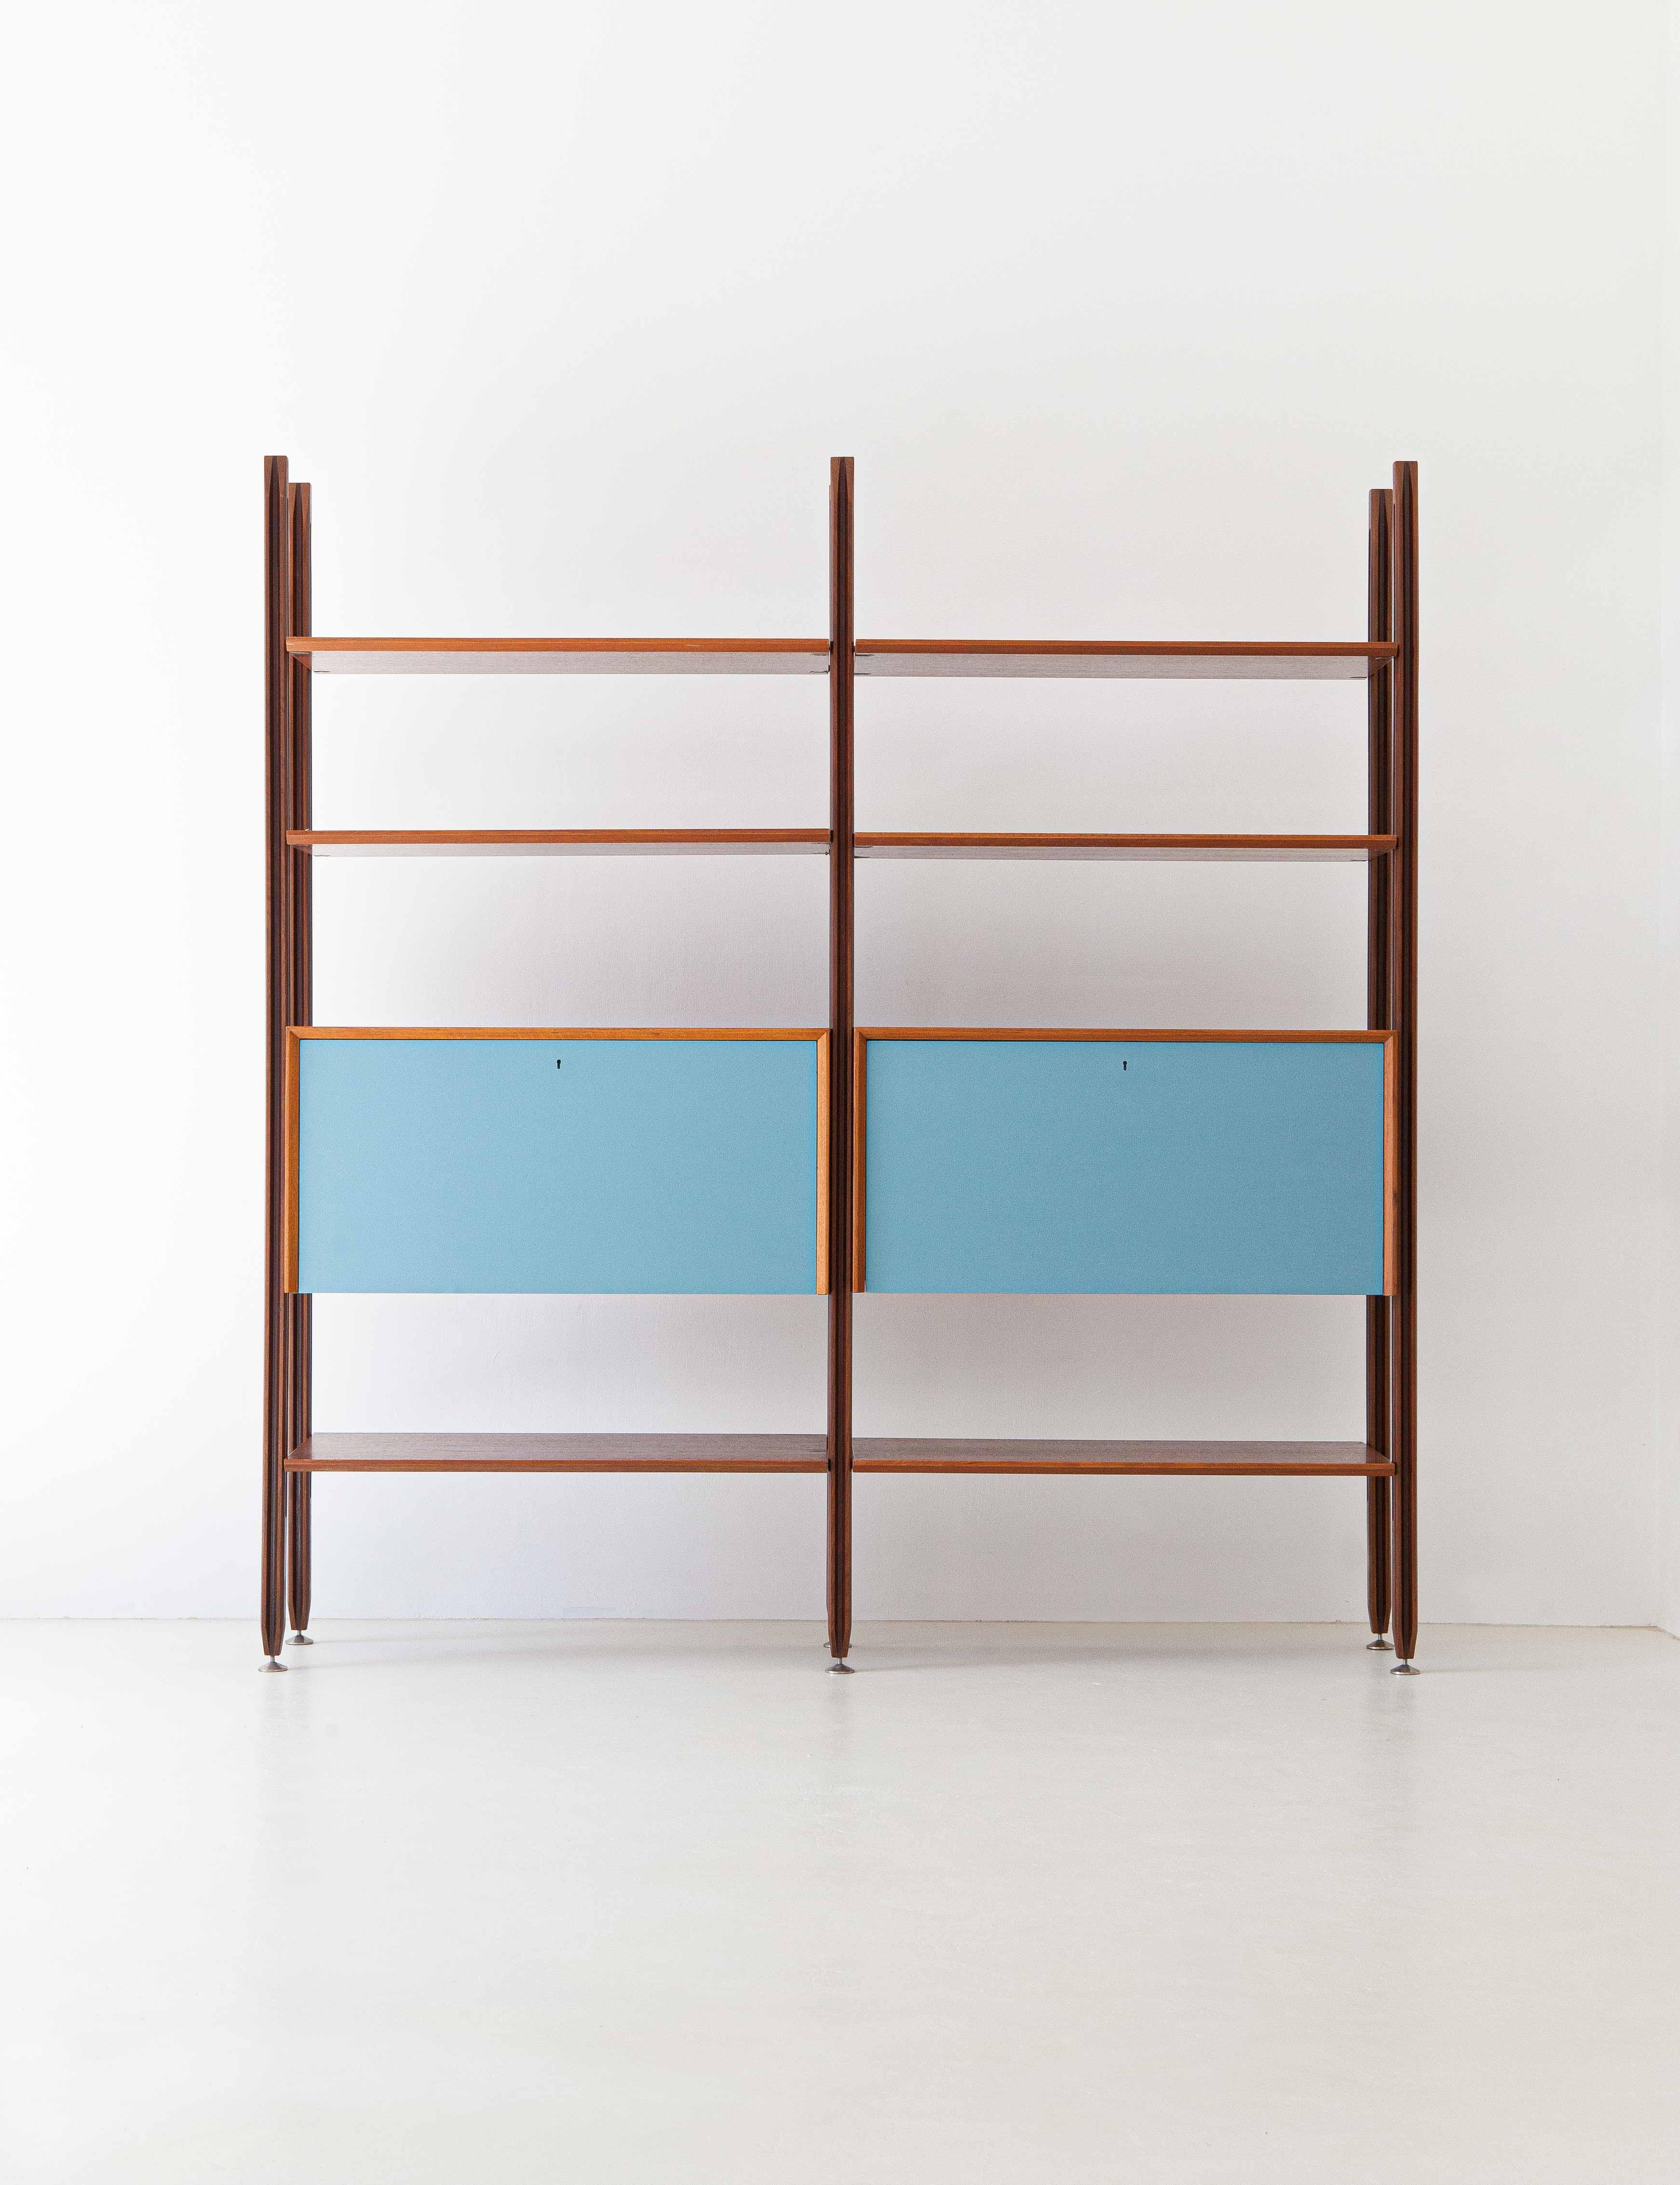 1960s-teak-bookshelf-with-light-blue-doors-2-WU38